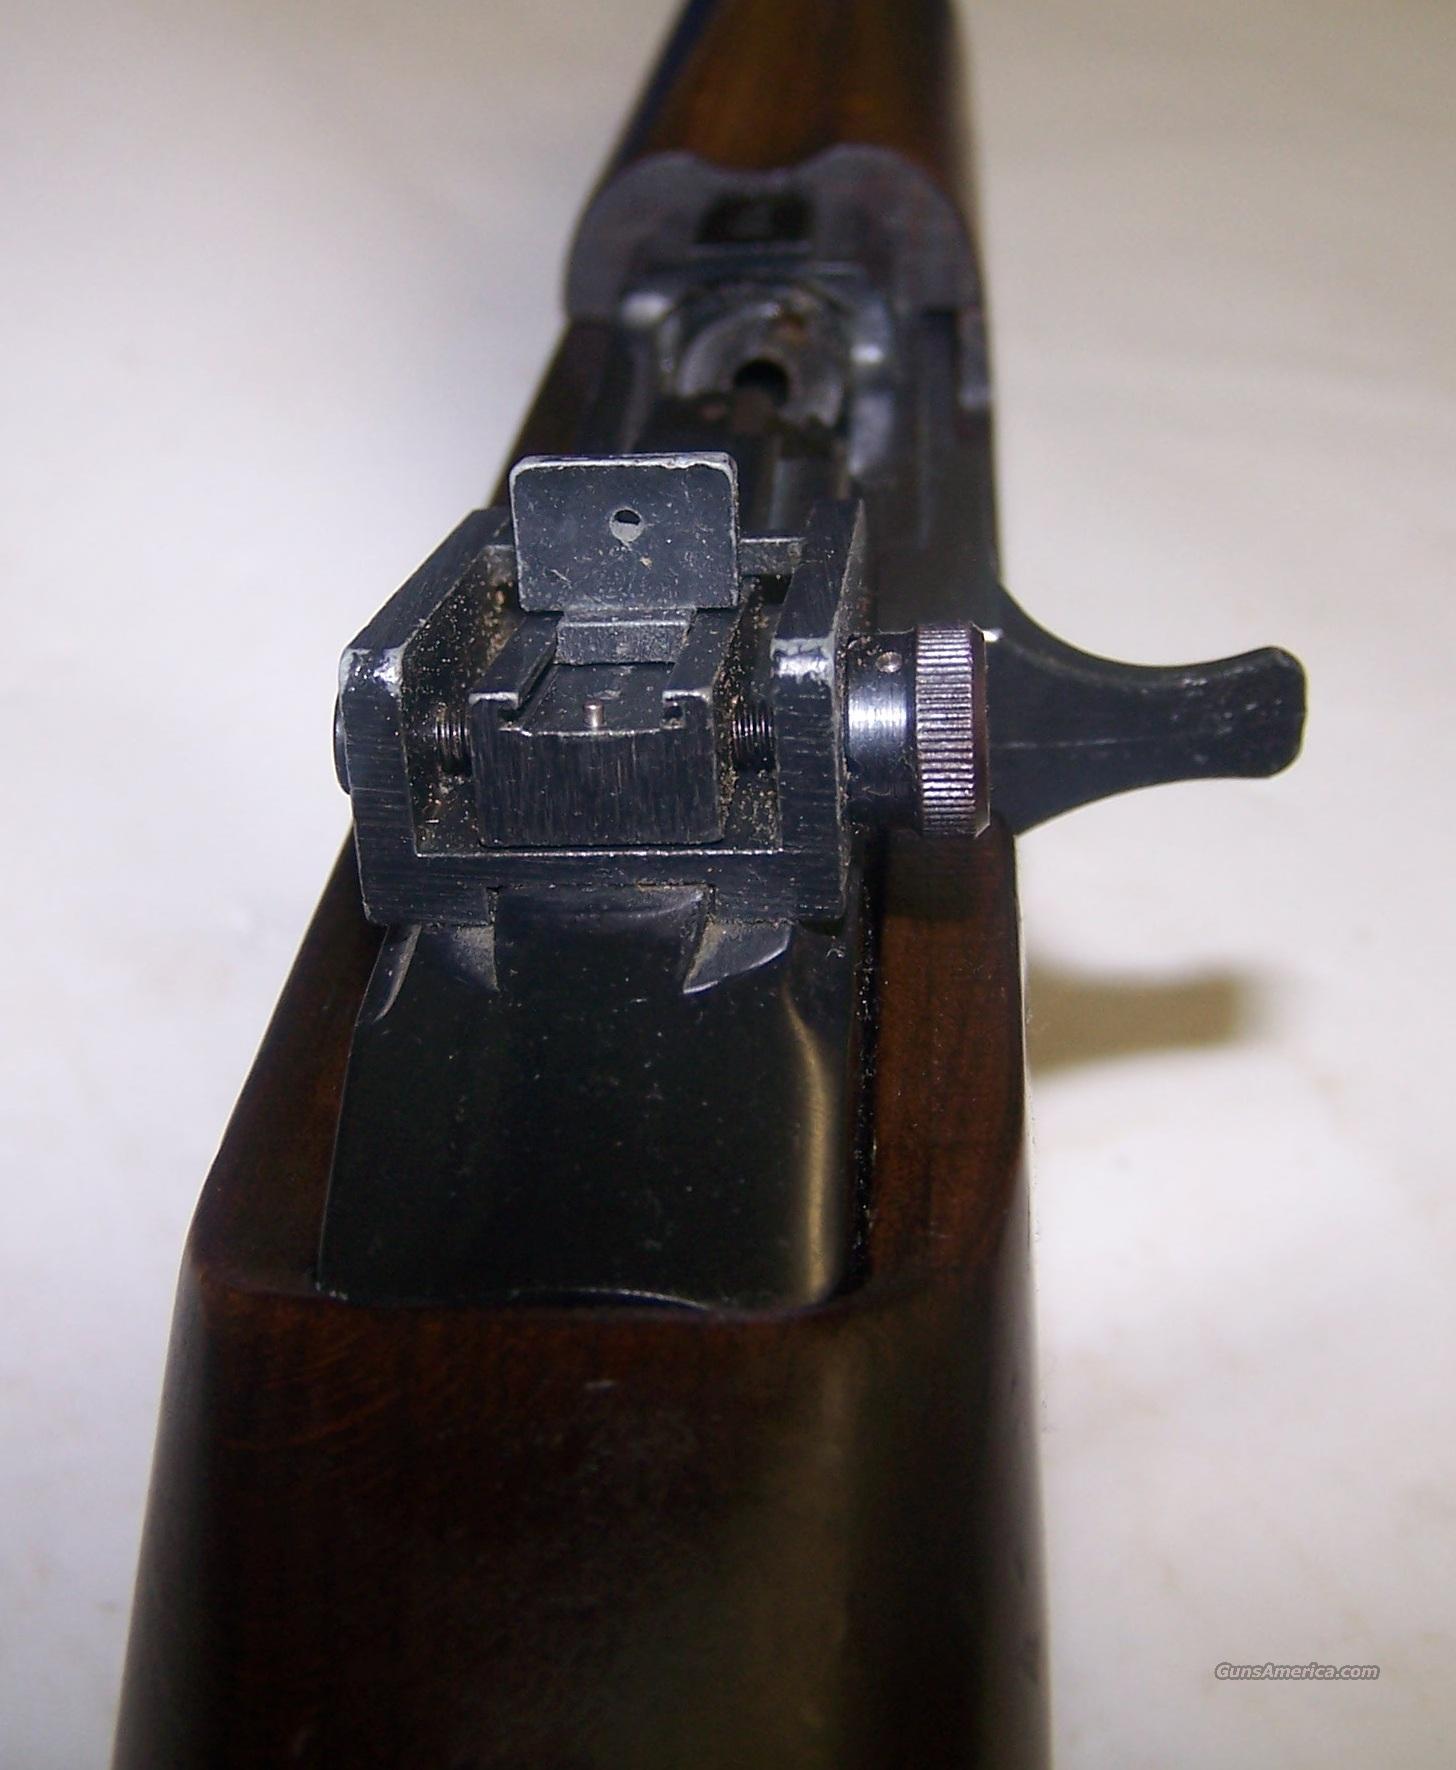 Erma werke model e m1 carbine bolt action rifle 22lr